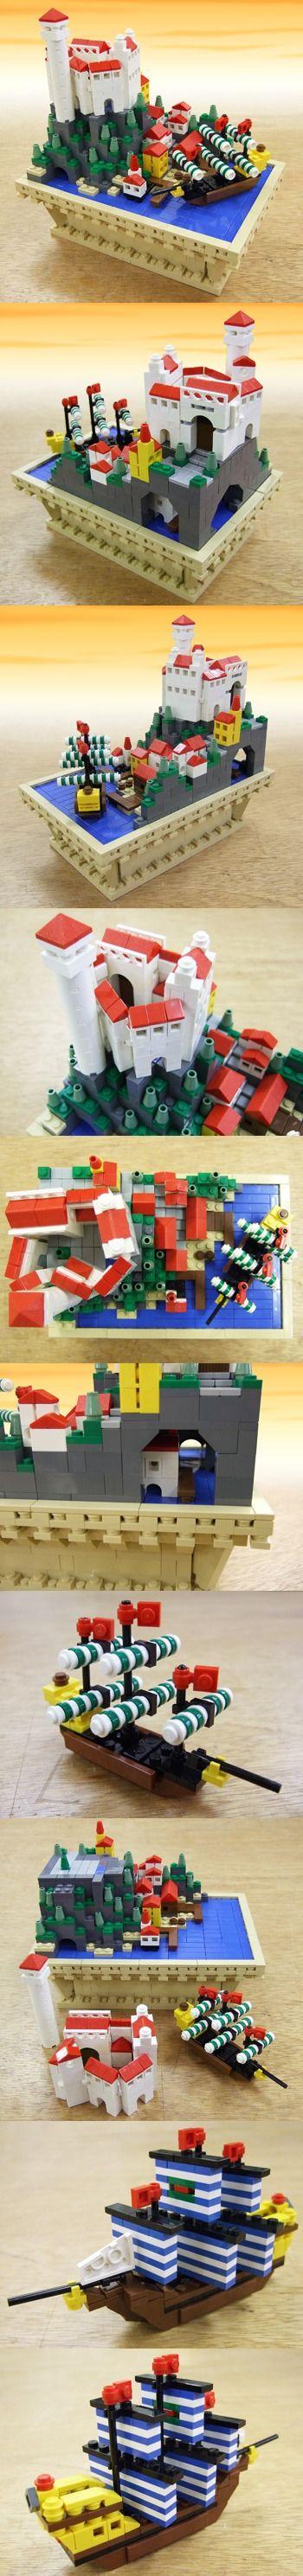 Microscale CASTLE   LEGO, LEGO, LEGO   Pinterest   Castles ...